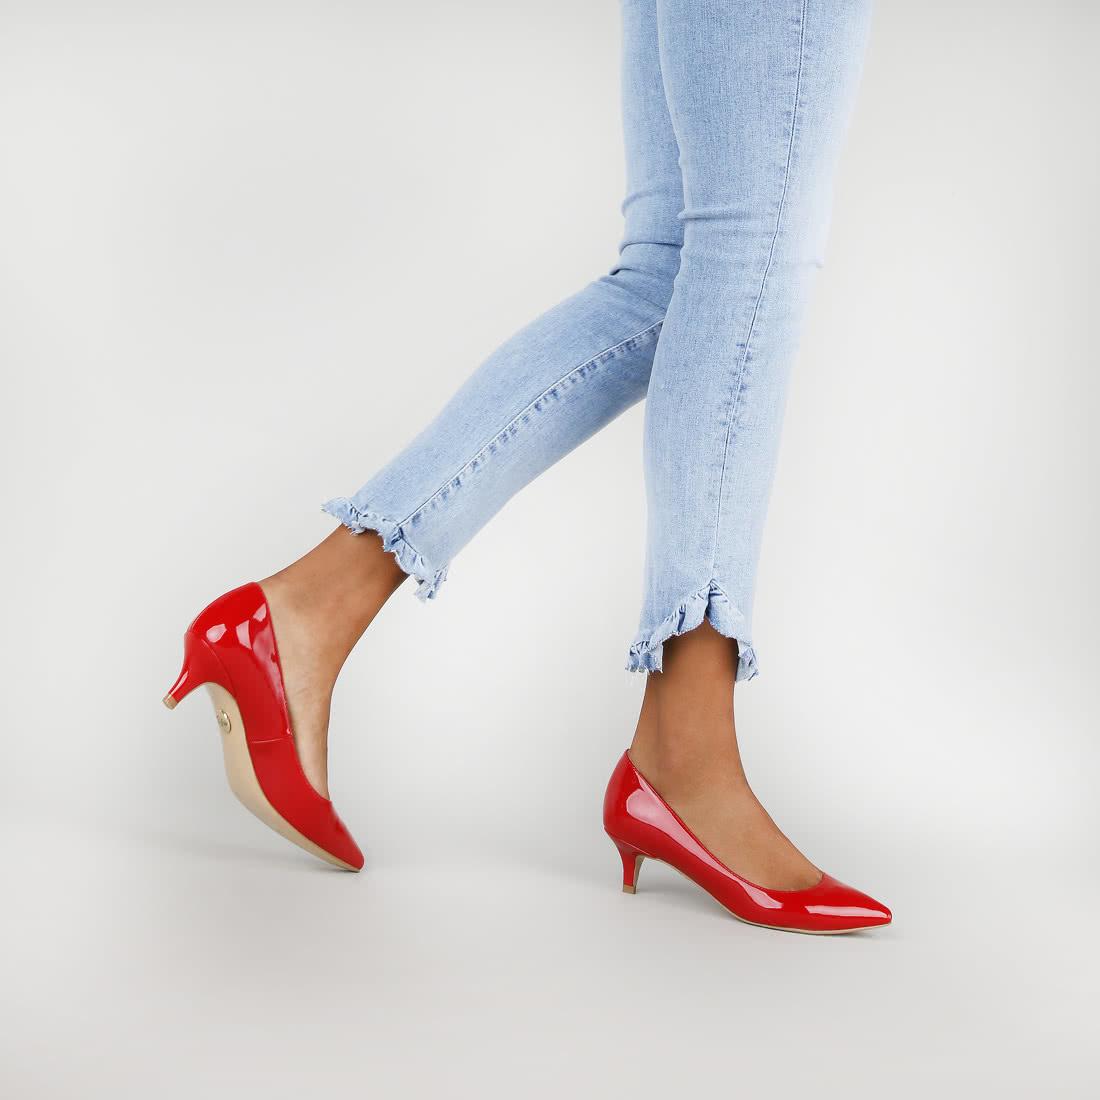 Amber Pumps Lackoptik rot online kaufen | BUFFALO®